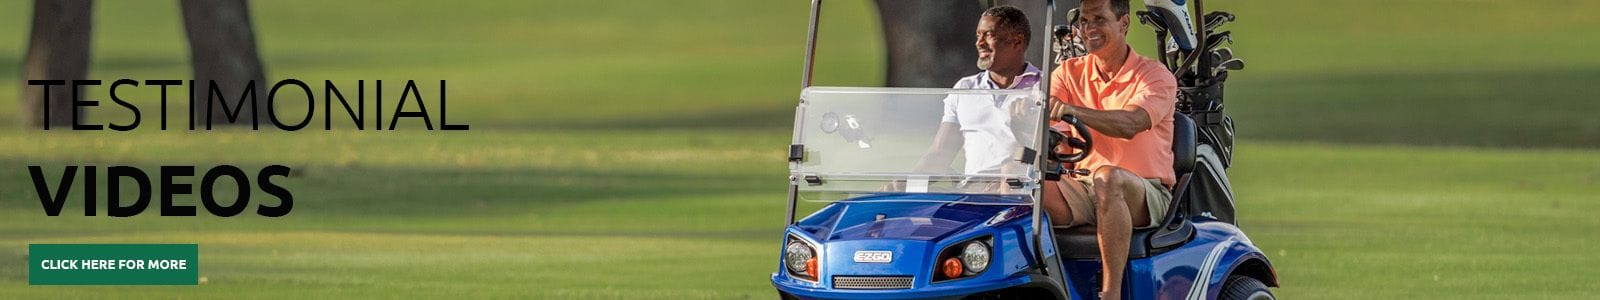 Golf Car World | Customer Testimonial Videos